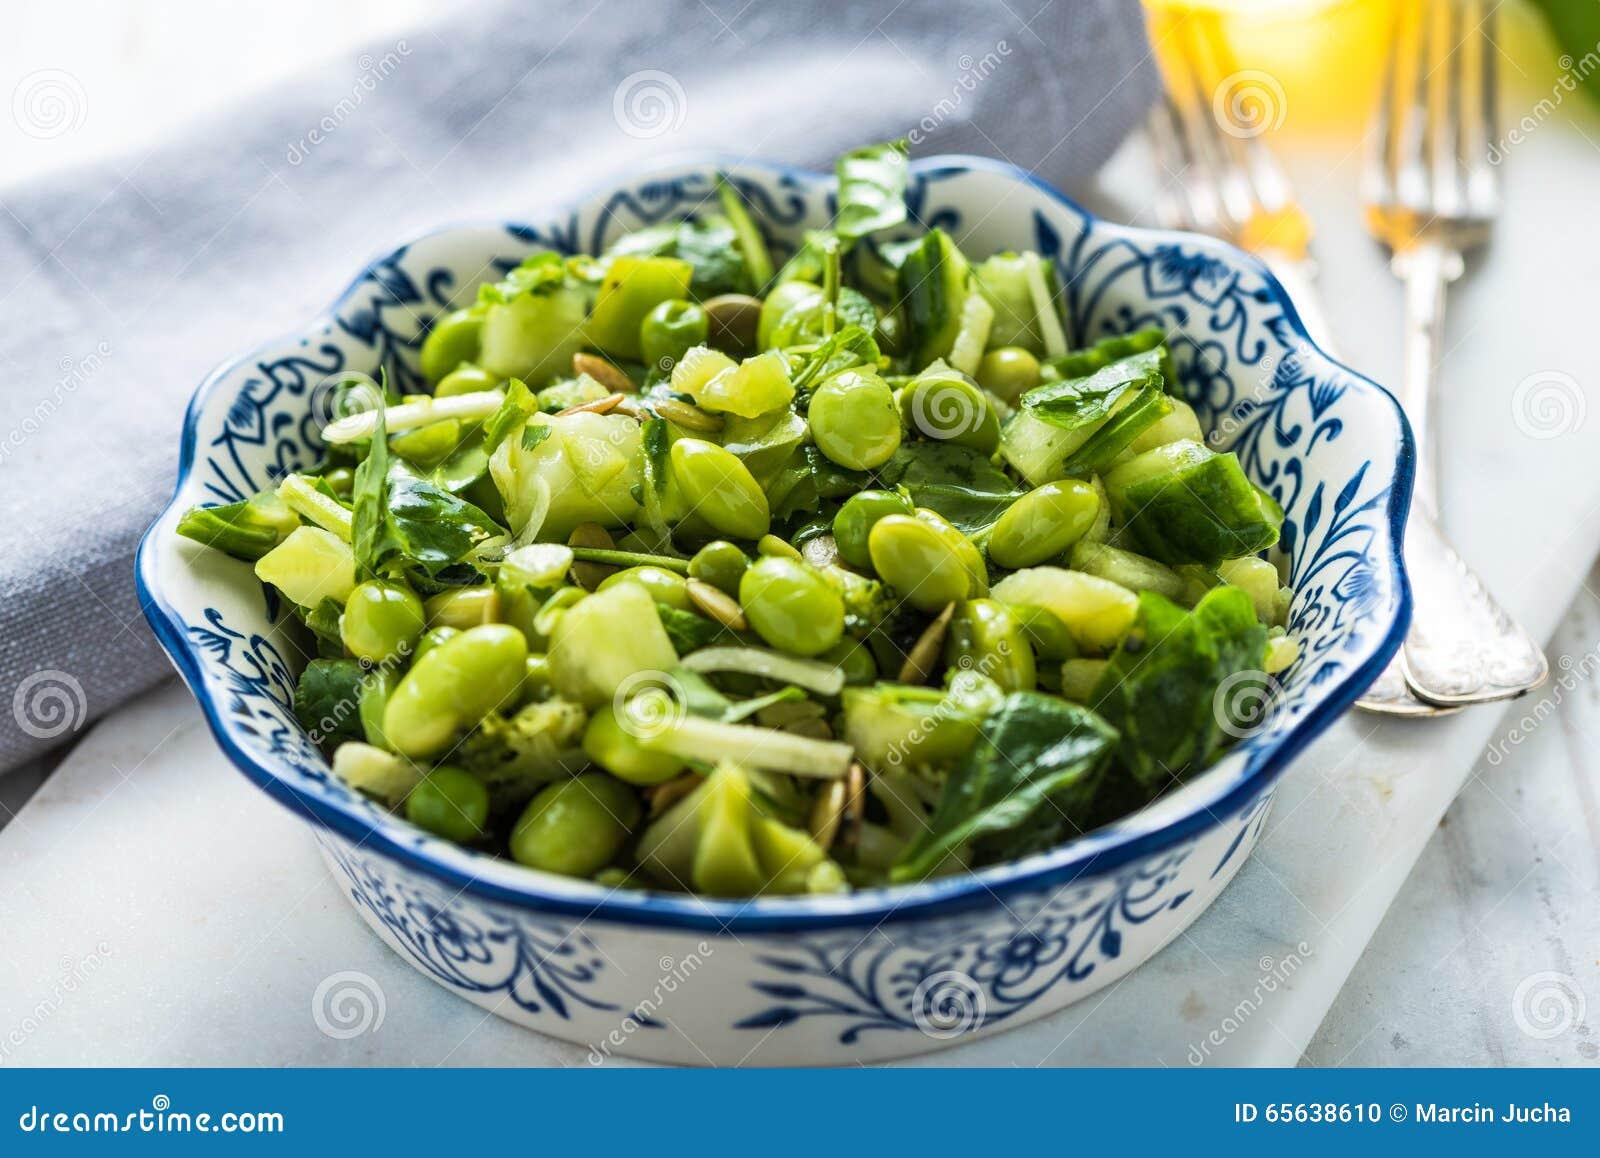 Nourriture verte superbe, salade saine